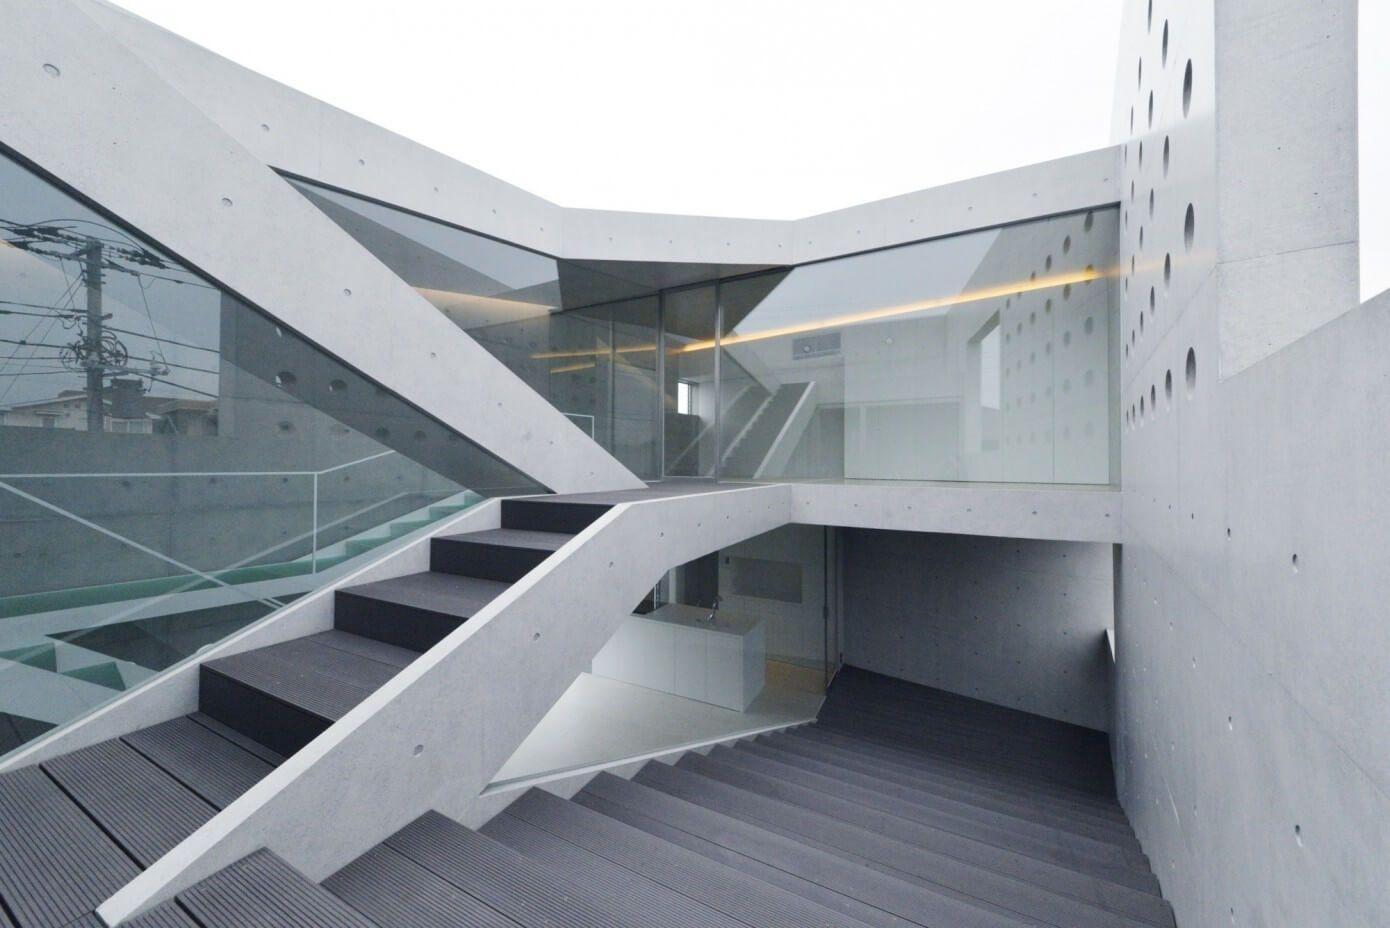 001-house-tsudanuma-fuseatelier-1390x928.jpg (1390×928)